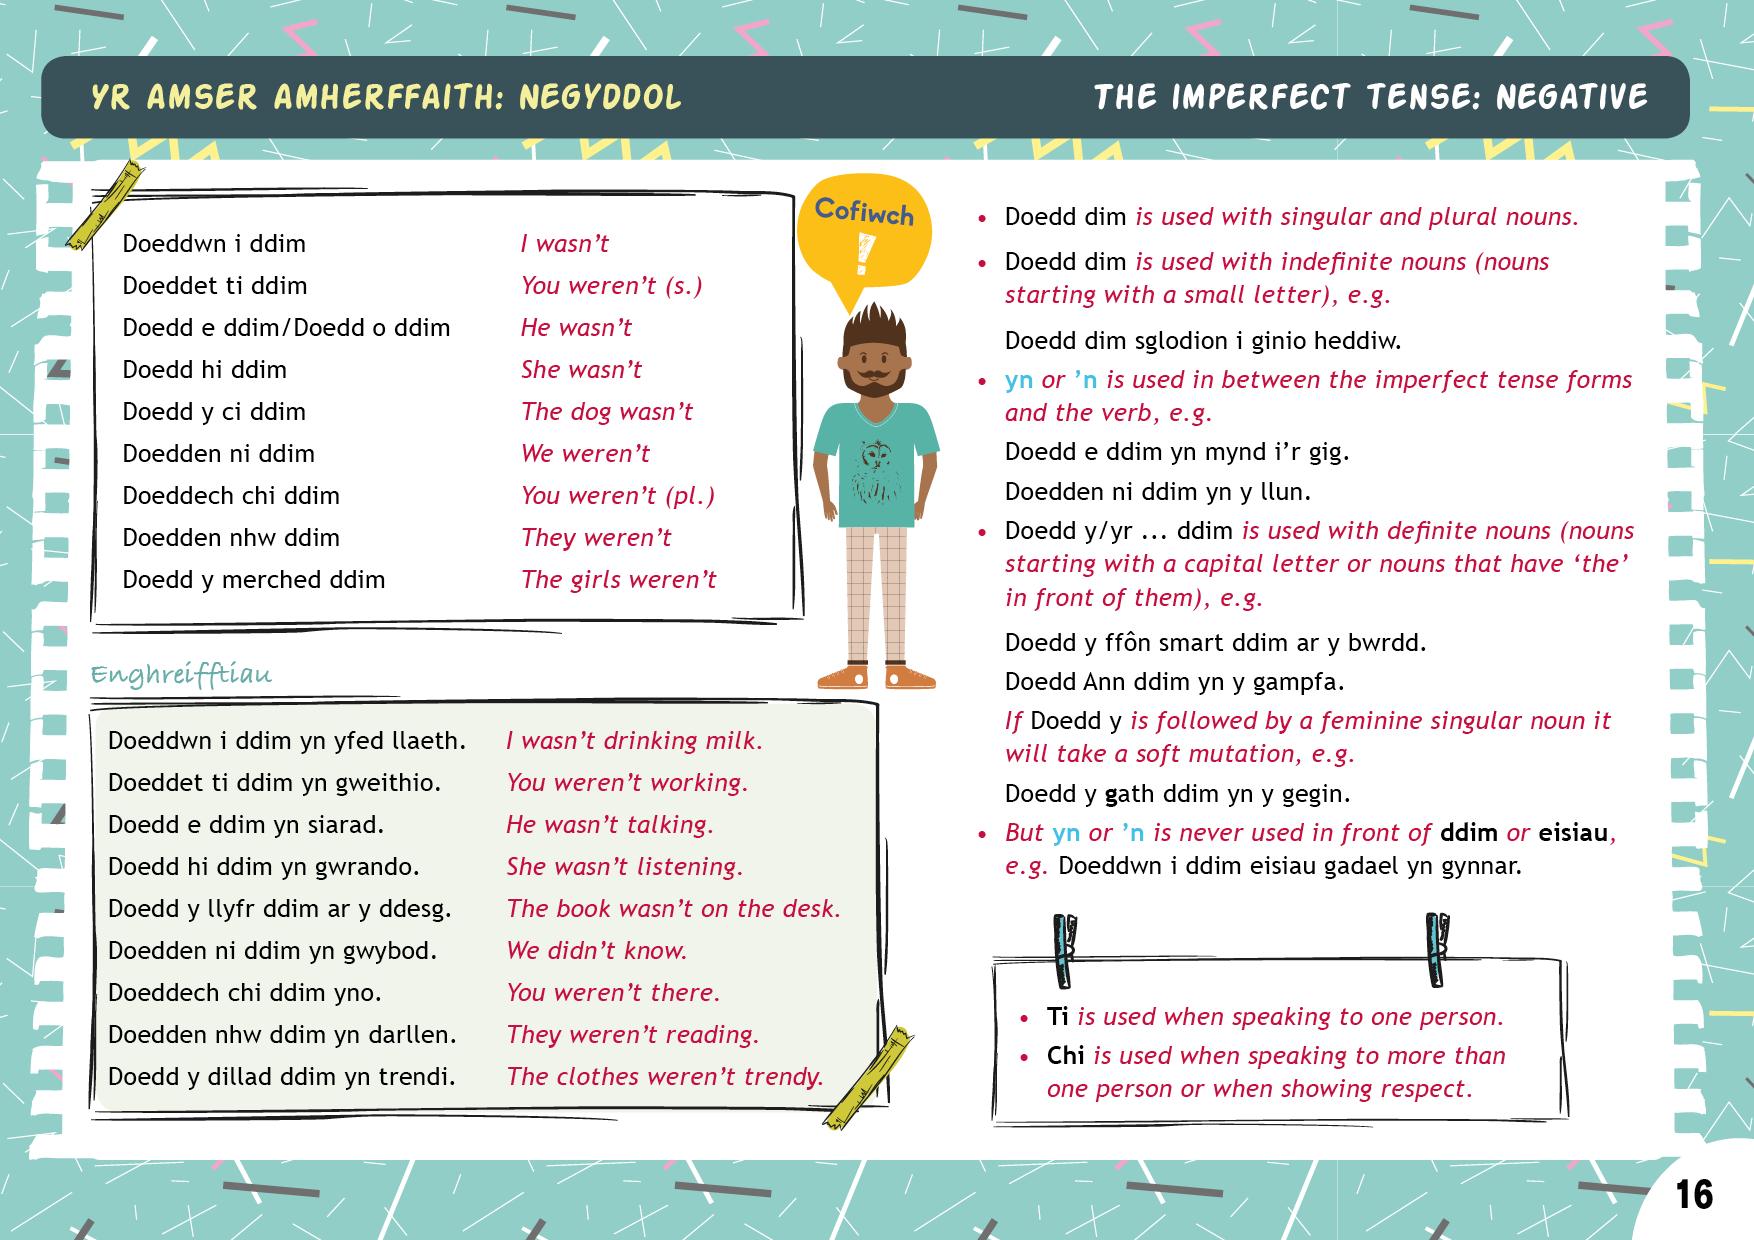 Yr amser amherffaith: negyddol | The imperfect tense: negative